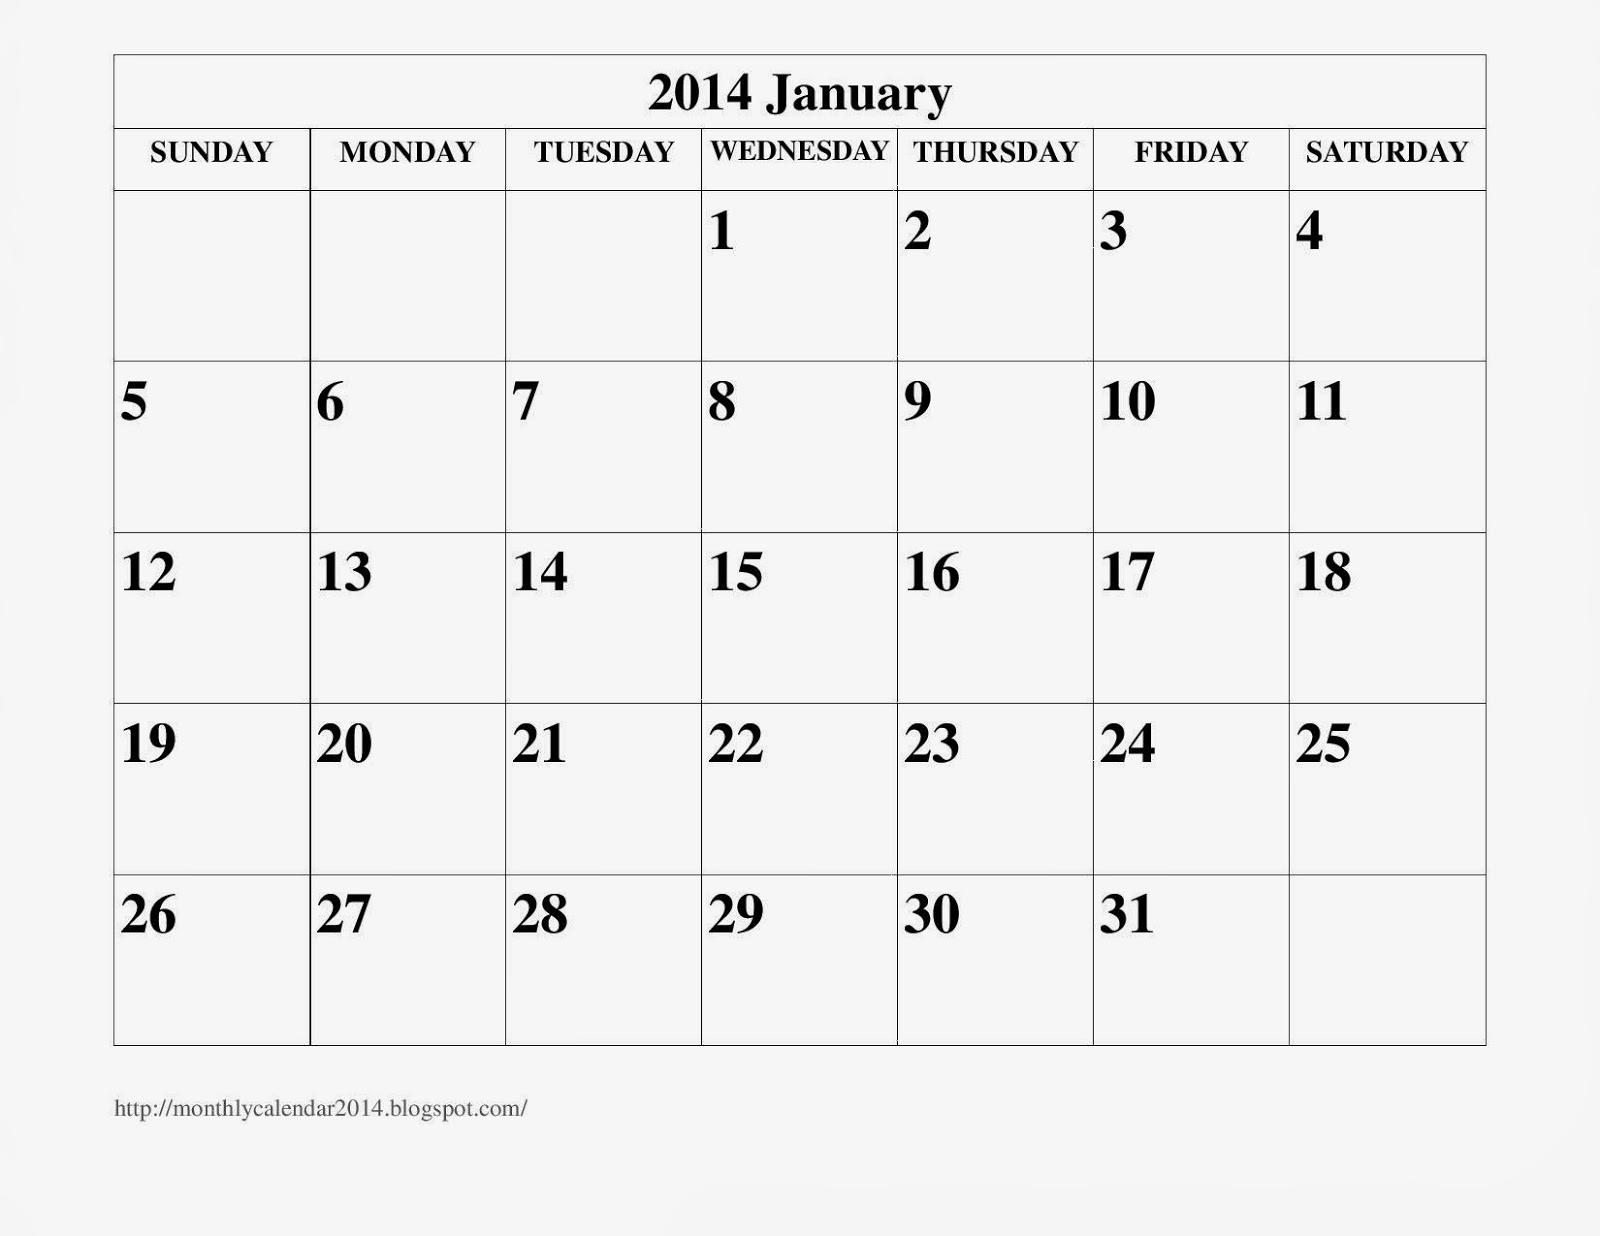 January 2014 Calendar Printable #16 - Printable Calendar 2014, Blank ...